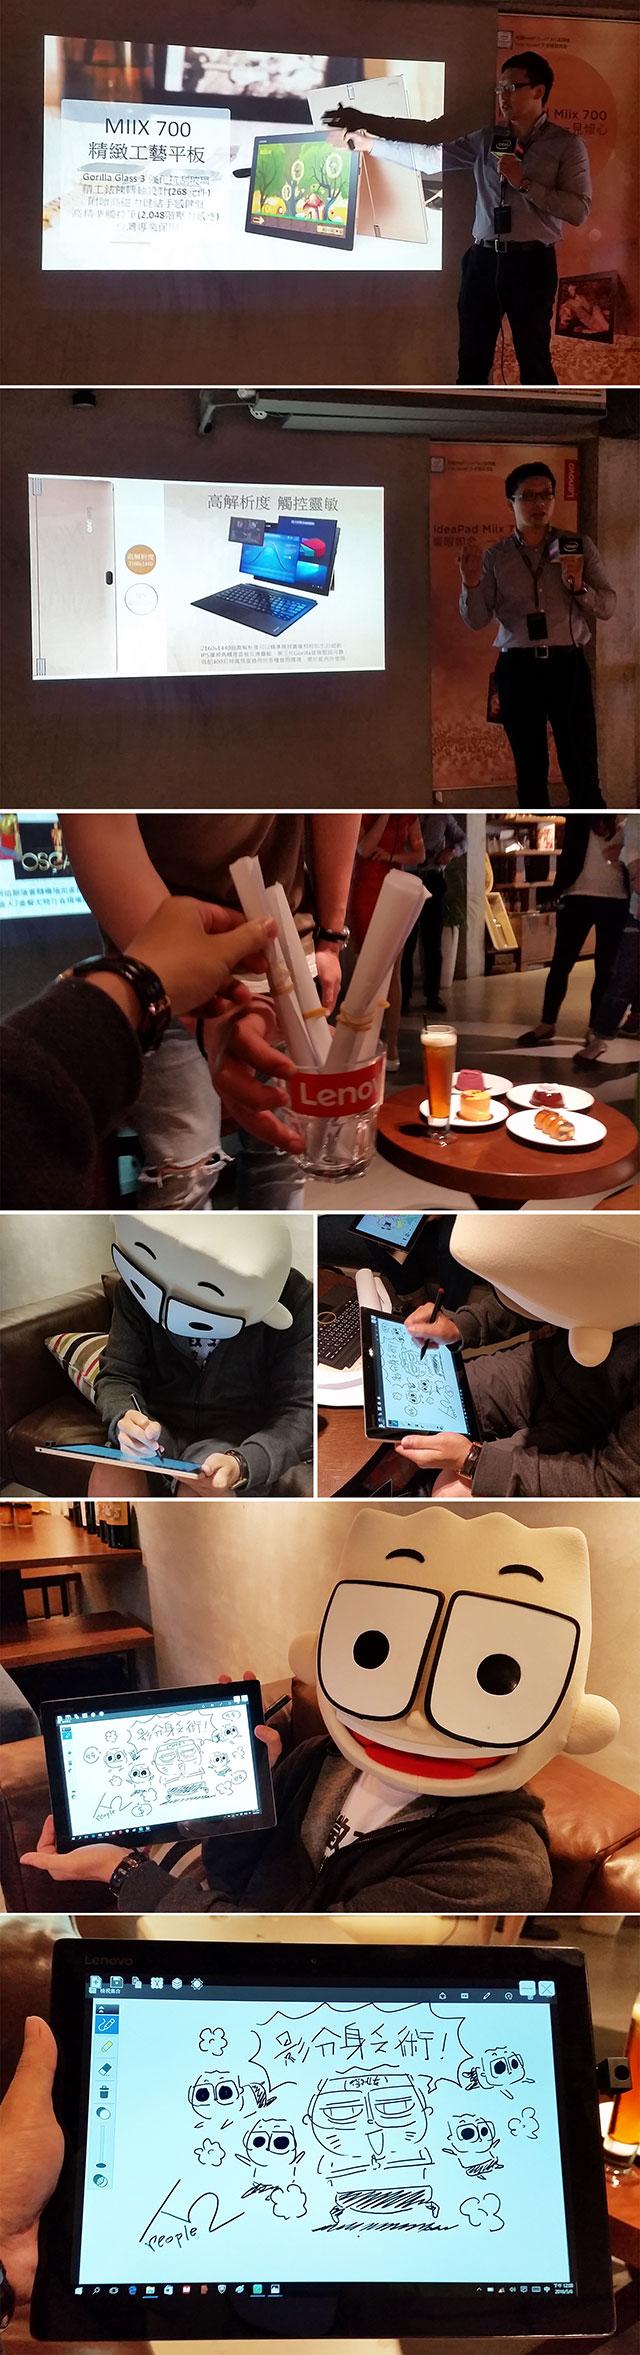 3C 耀眼如金 一見傾心 LenovoIdeaPadMiix700 觸控筆 筆電 平板 繪畫 就當人2吧 人2出書 徵女友 人2,People2